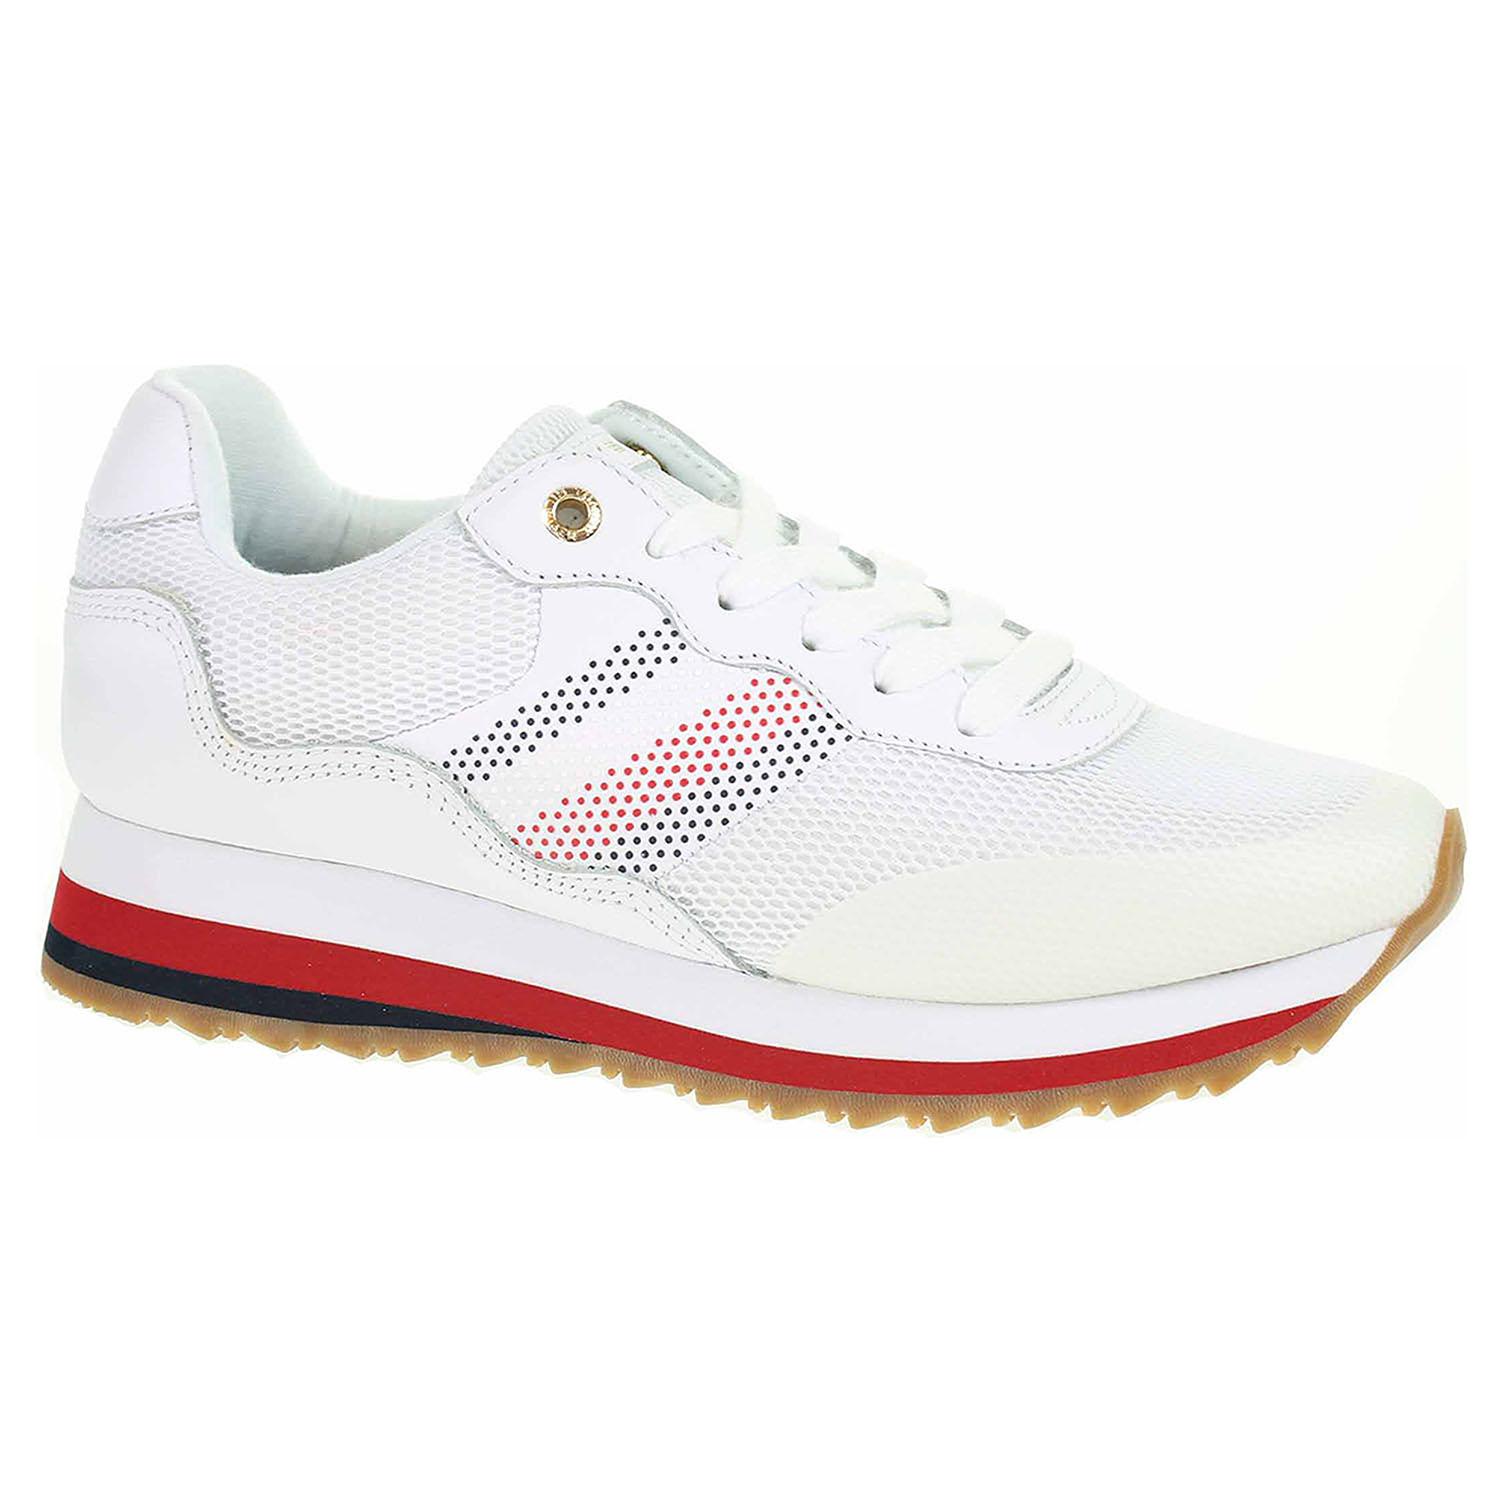 60b60acbbd090 Ecco Dámská obuv Tommy Hilfiger FW0FW04022 white 23200899